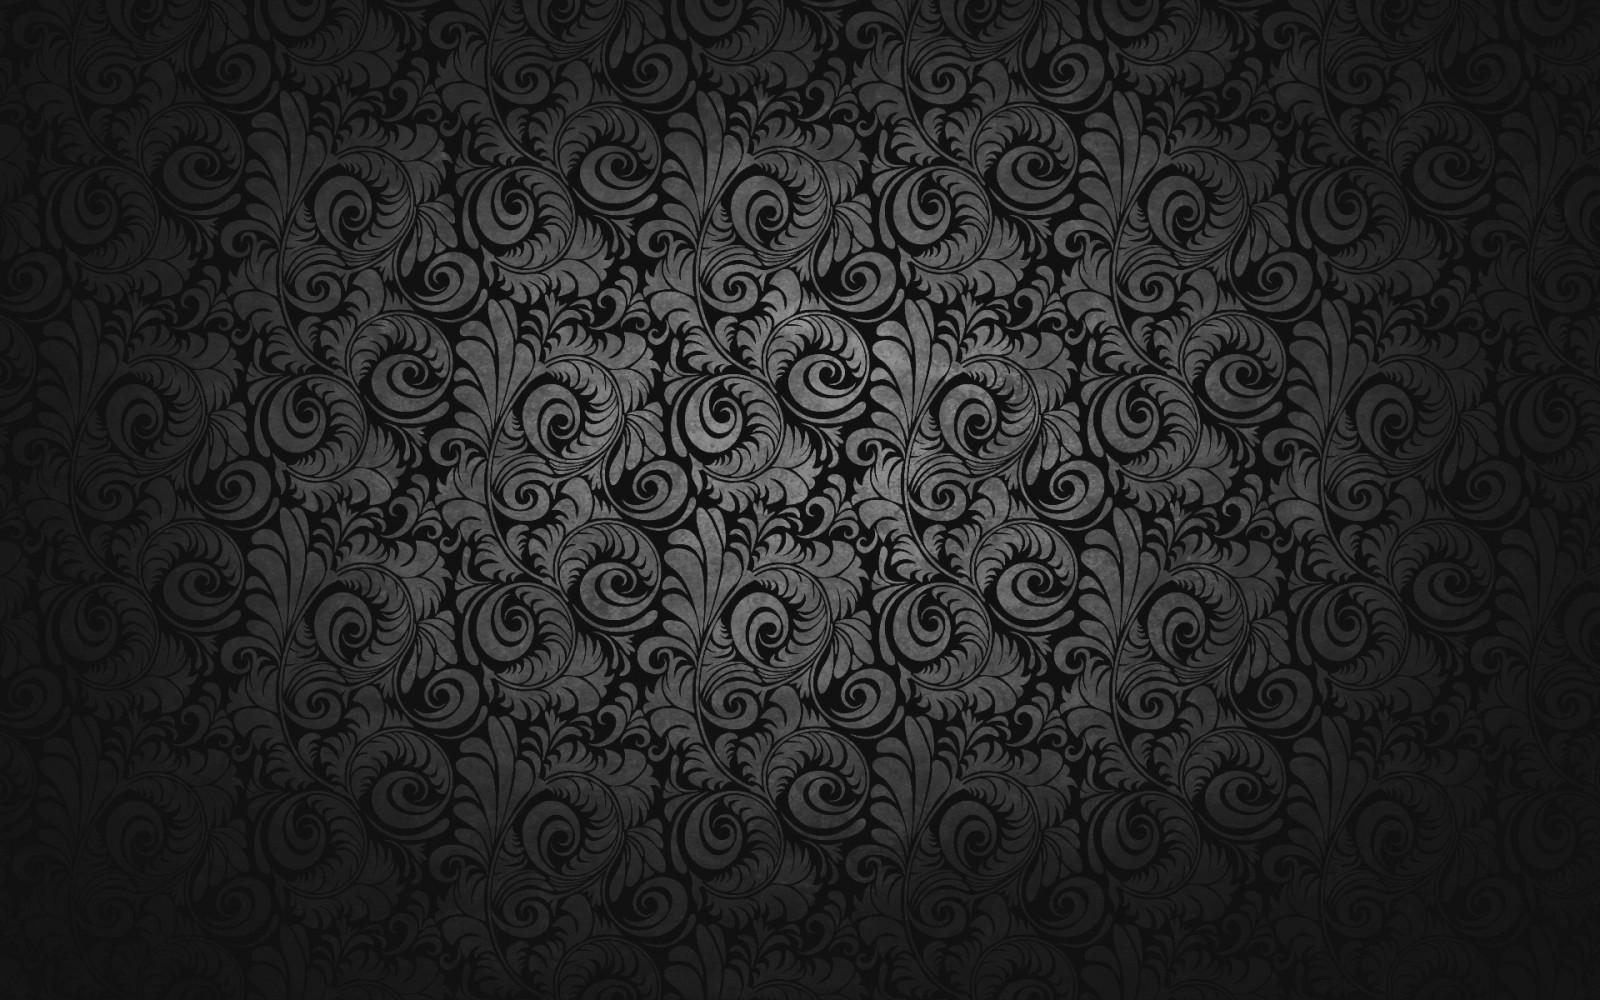 Wallpaper Satu Warna Gelap Simetri Pola Tekstur Lingkaran